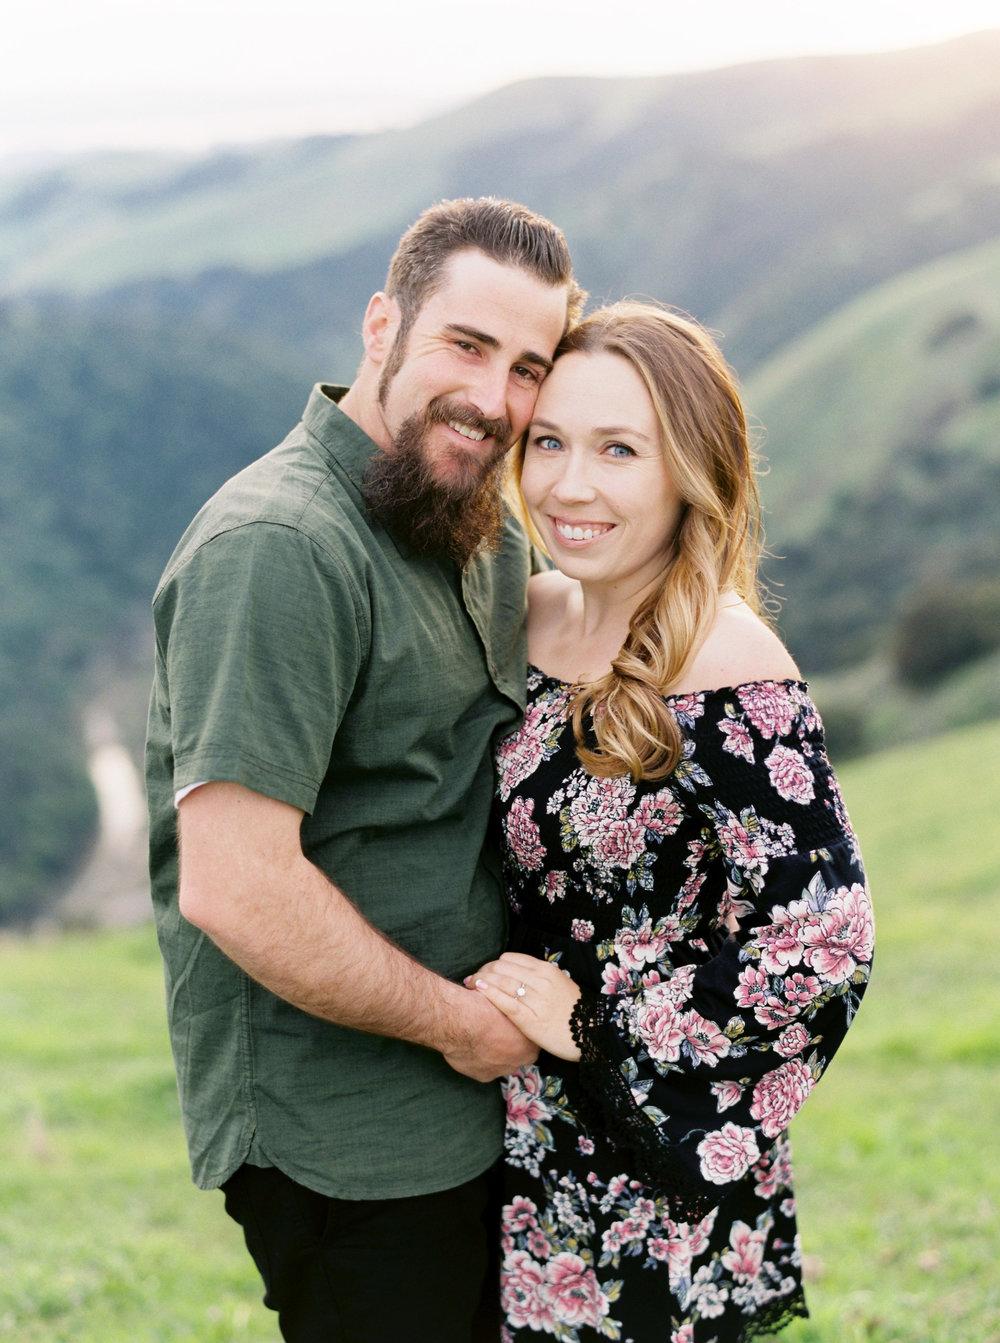 Sunol California Engagement Shoot - Kristine Herman Photography-18.jpg